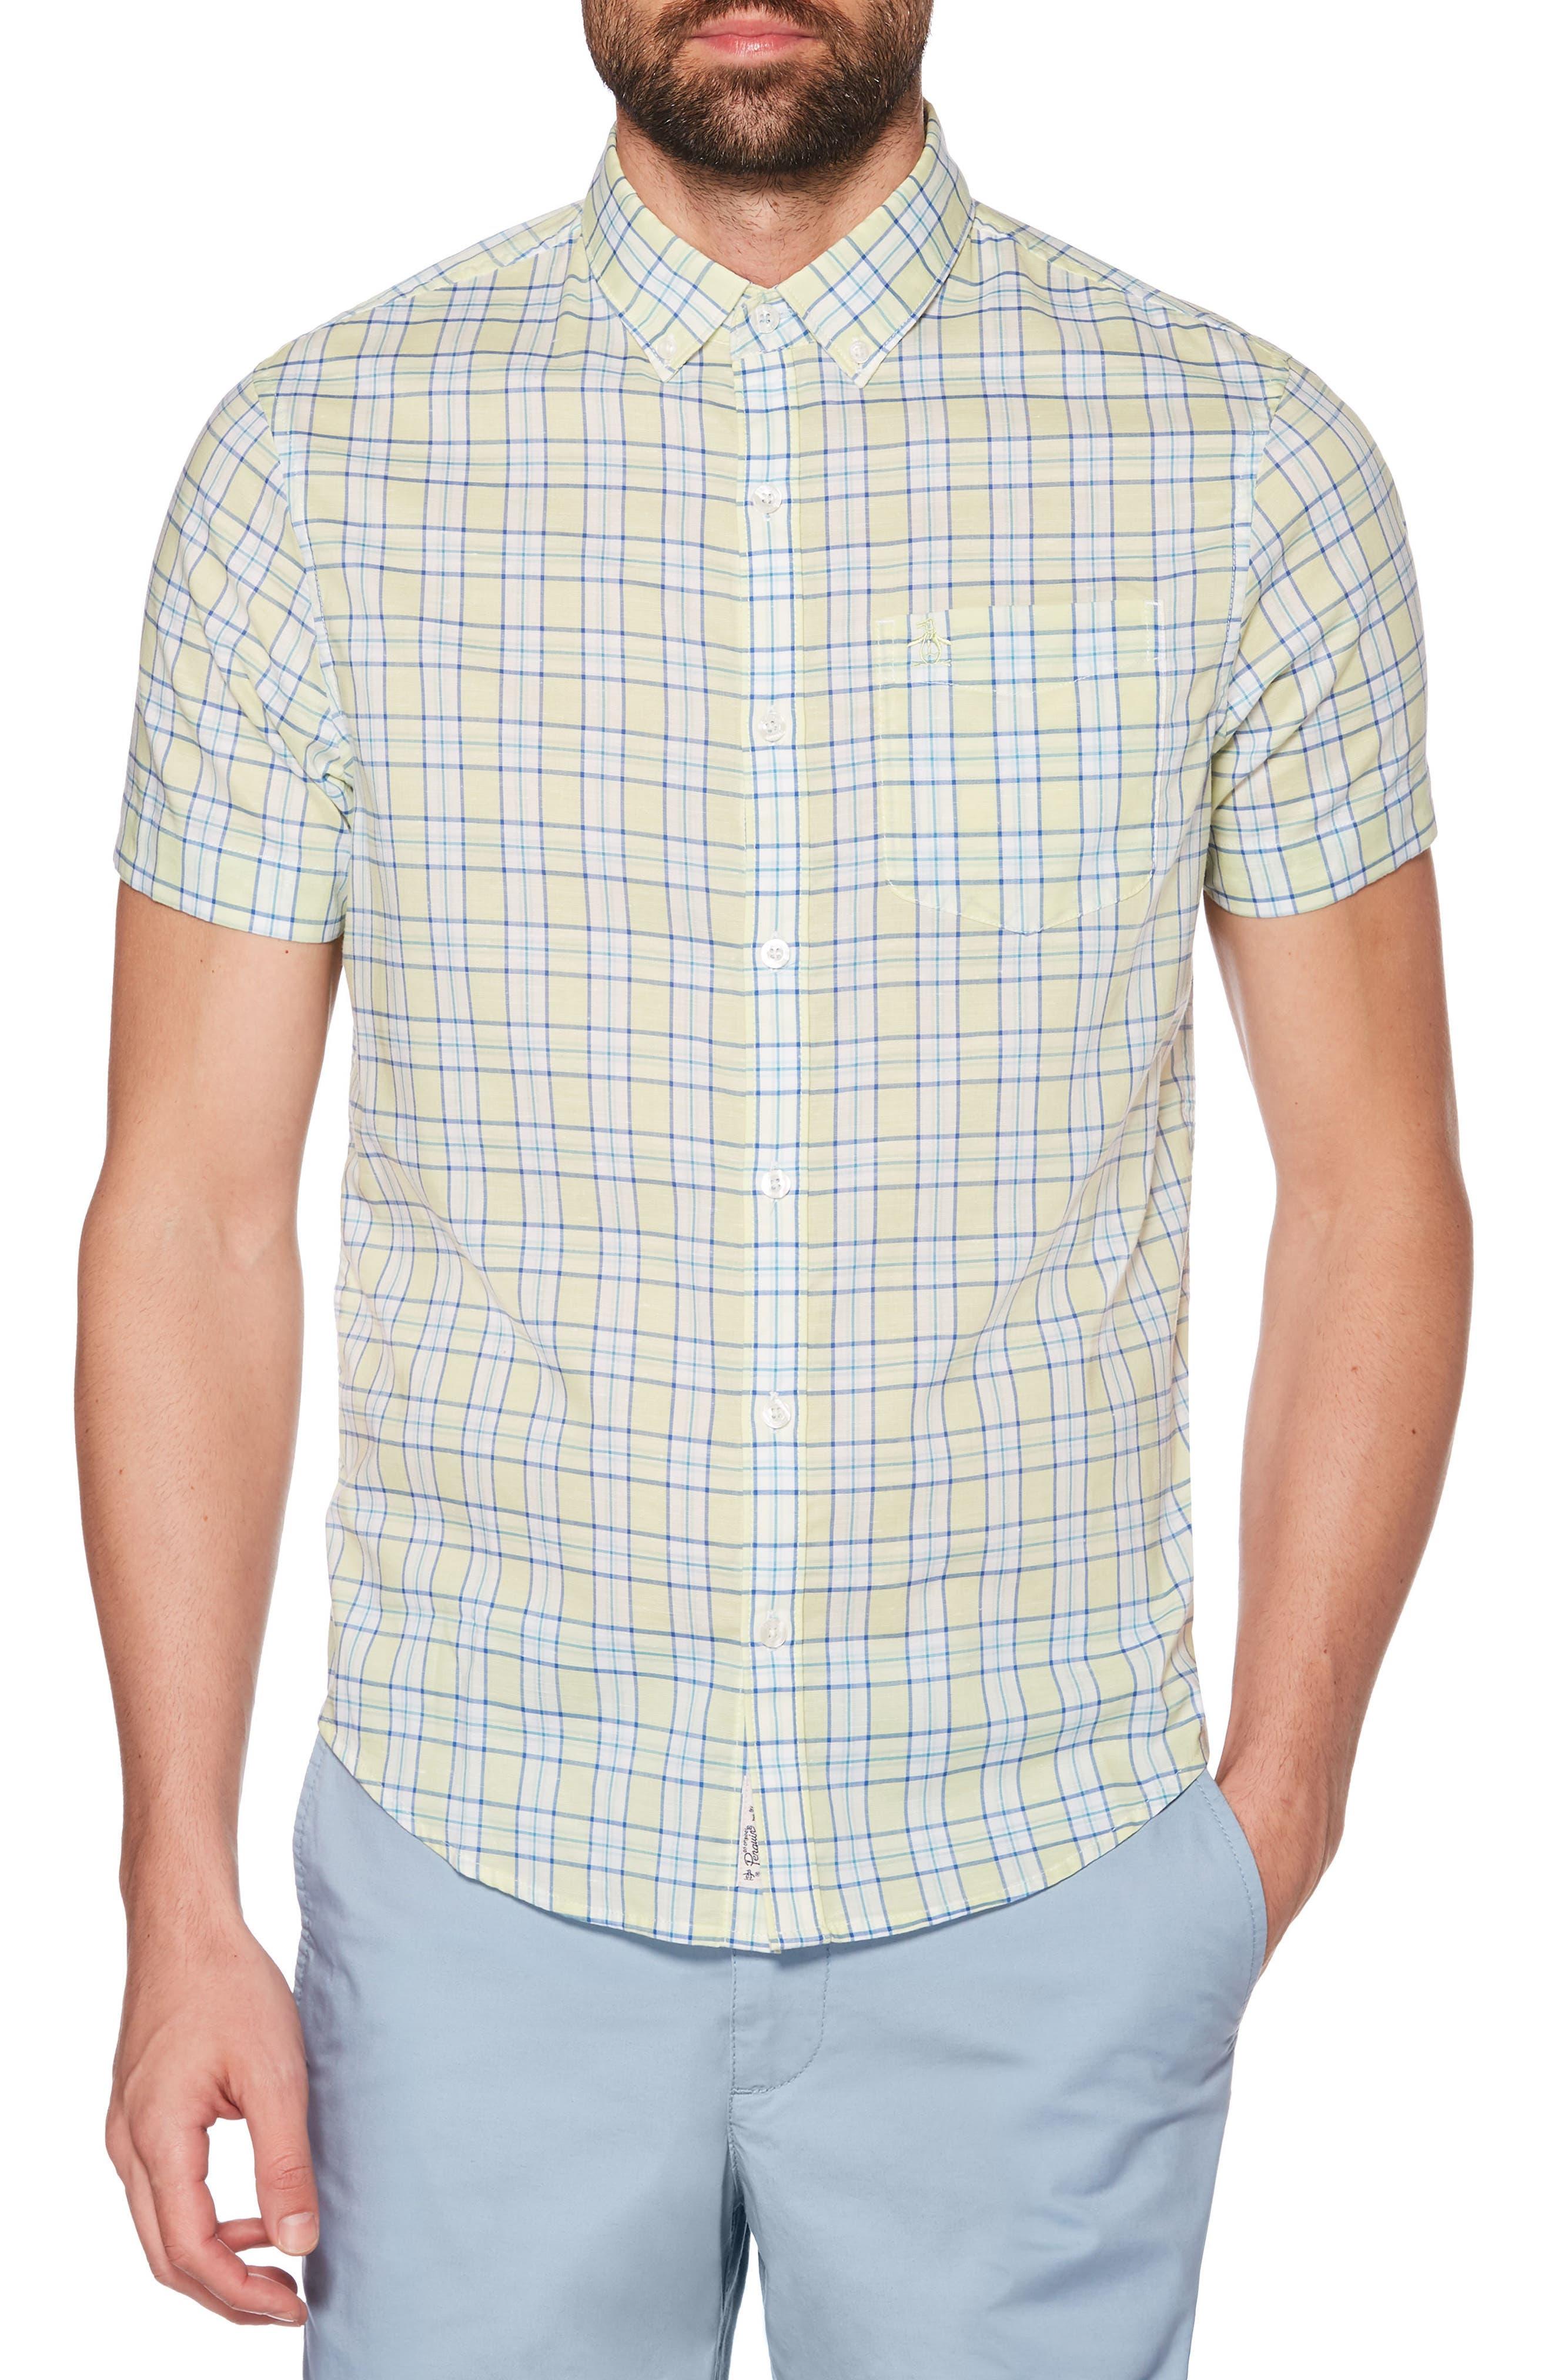 ORIGINAL PENGUIN Heritage Slim Fit Stretch Plaid Shirt, Main, color, BUTTERFLY